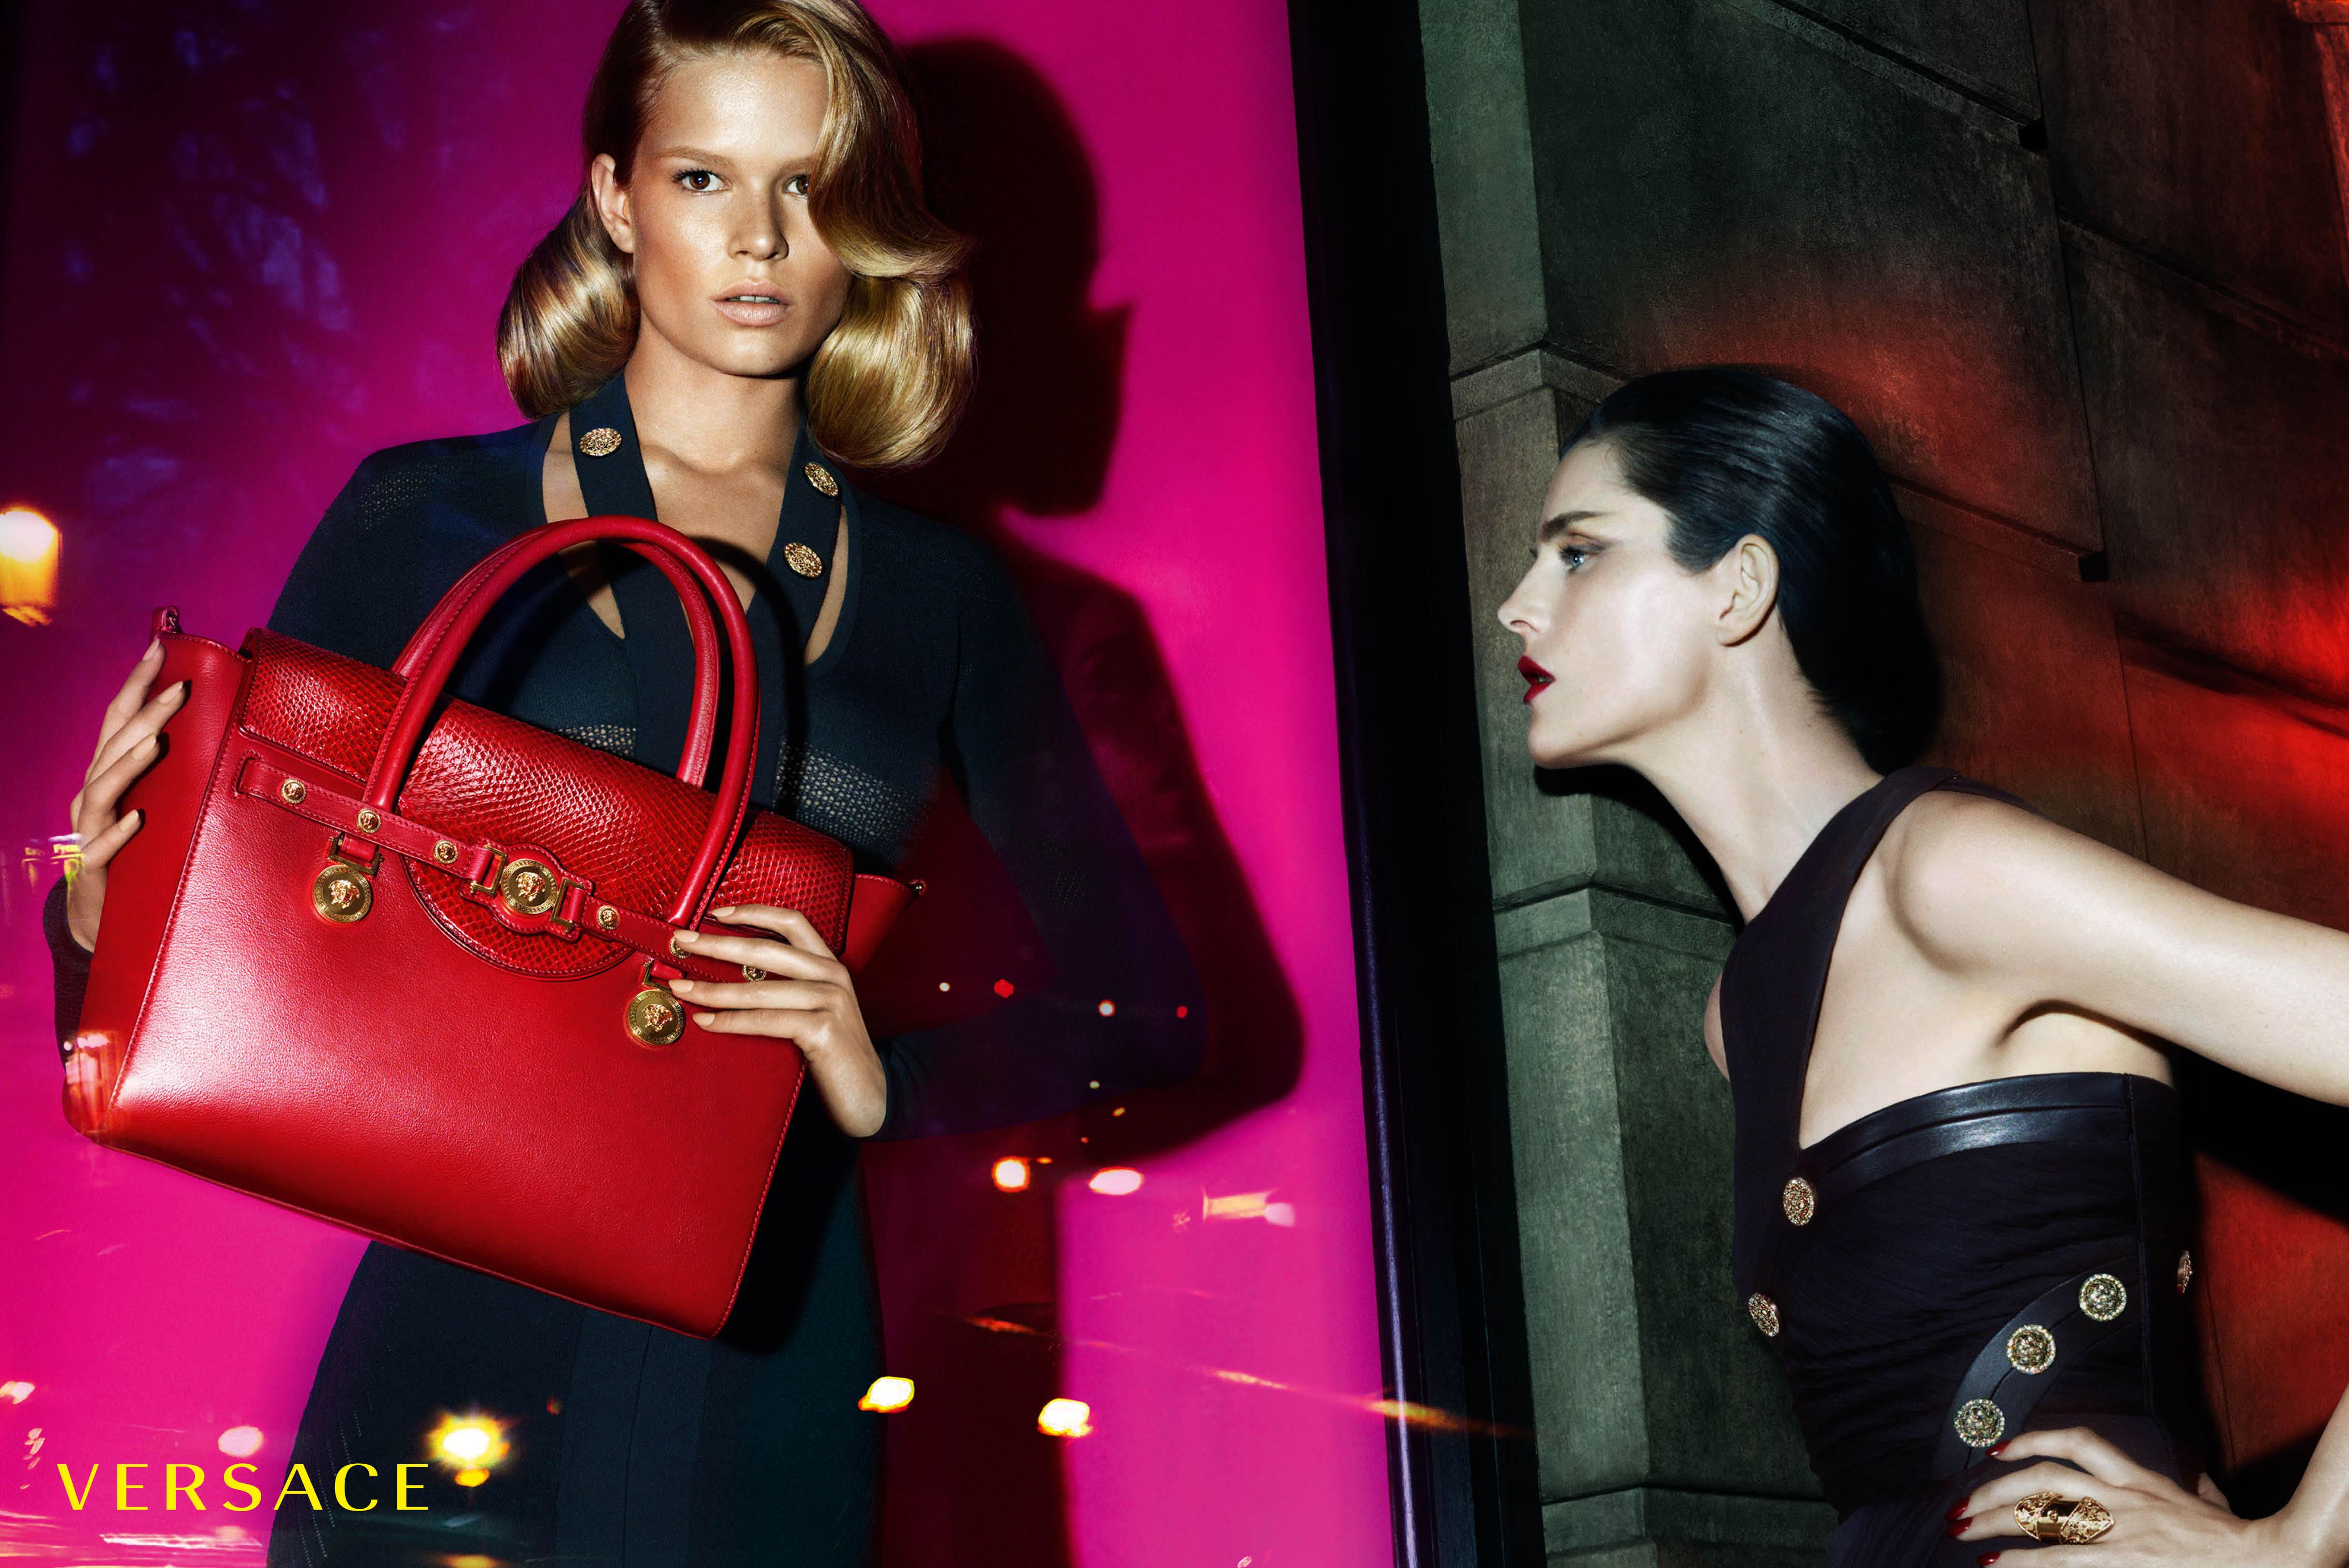 VERSACE luxury ad campaign logo